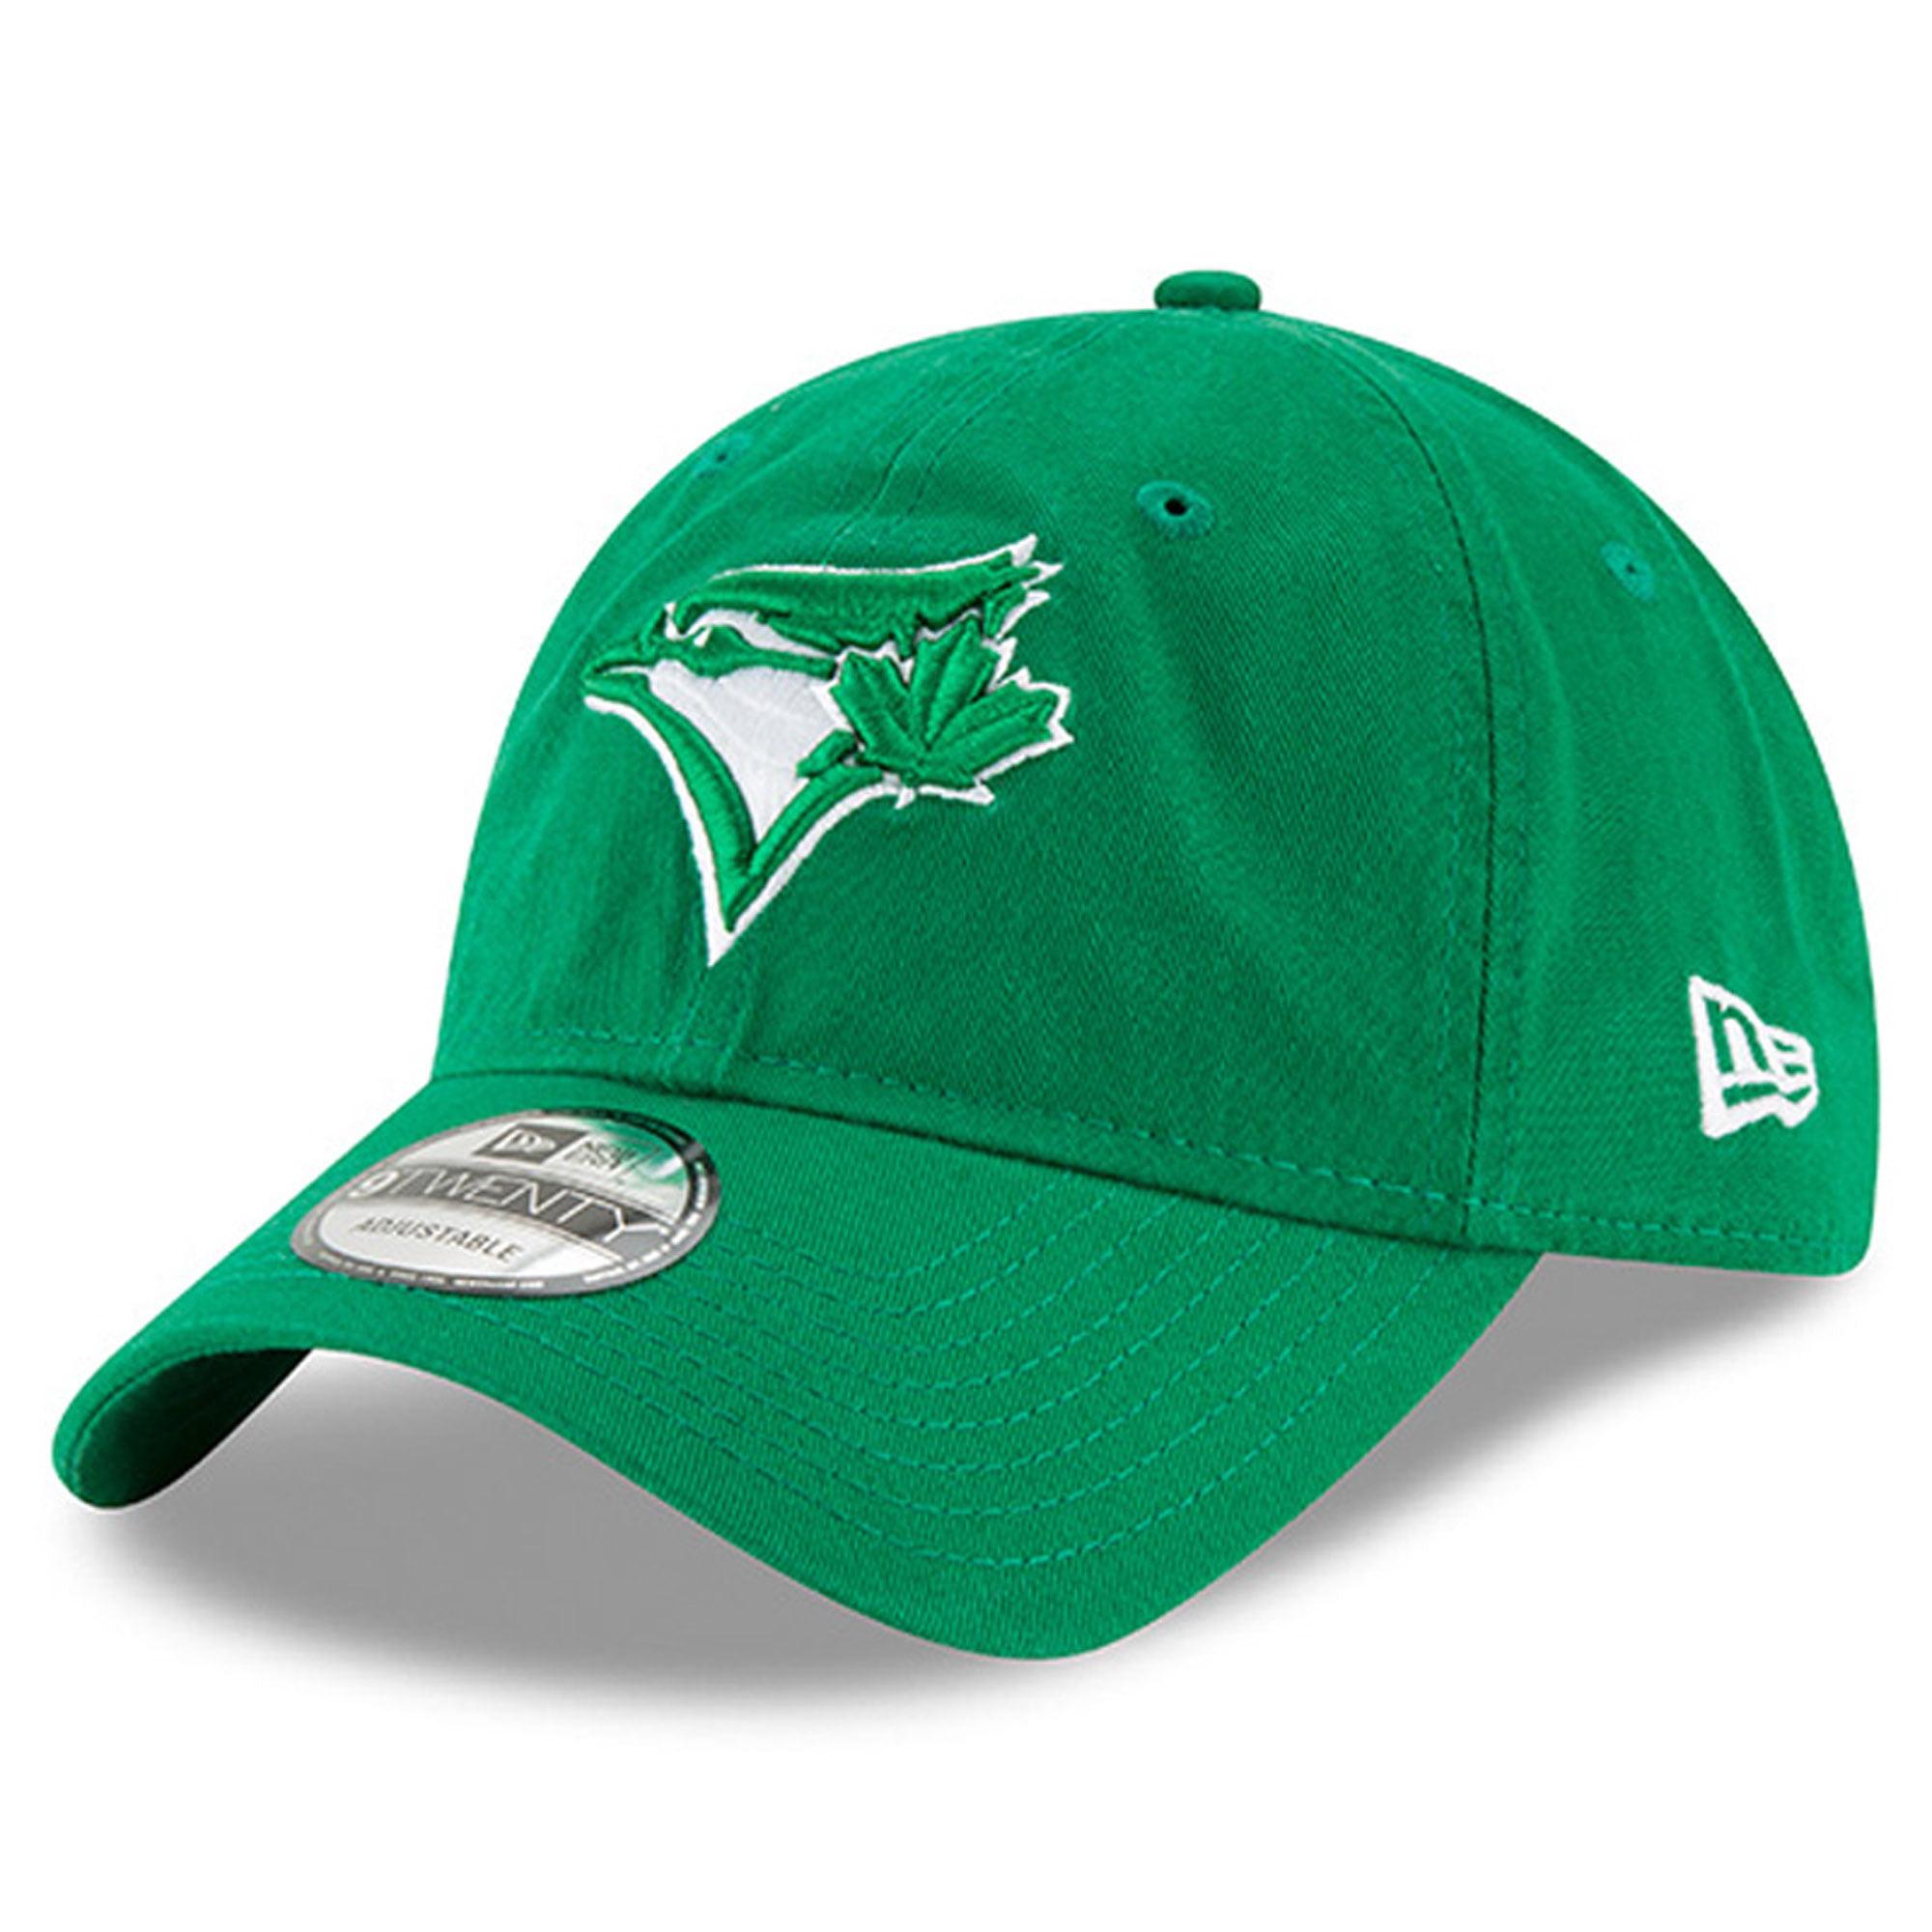 Toronto Blue Jays New Era Women's 2018 St. Patrick's Day Prolight 9TWENTY Adjustable Hat - Green - OSFA